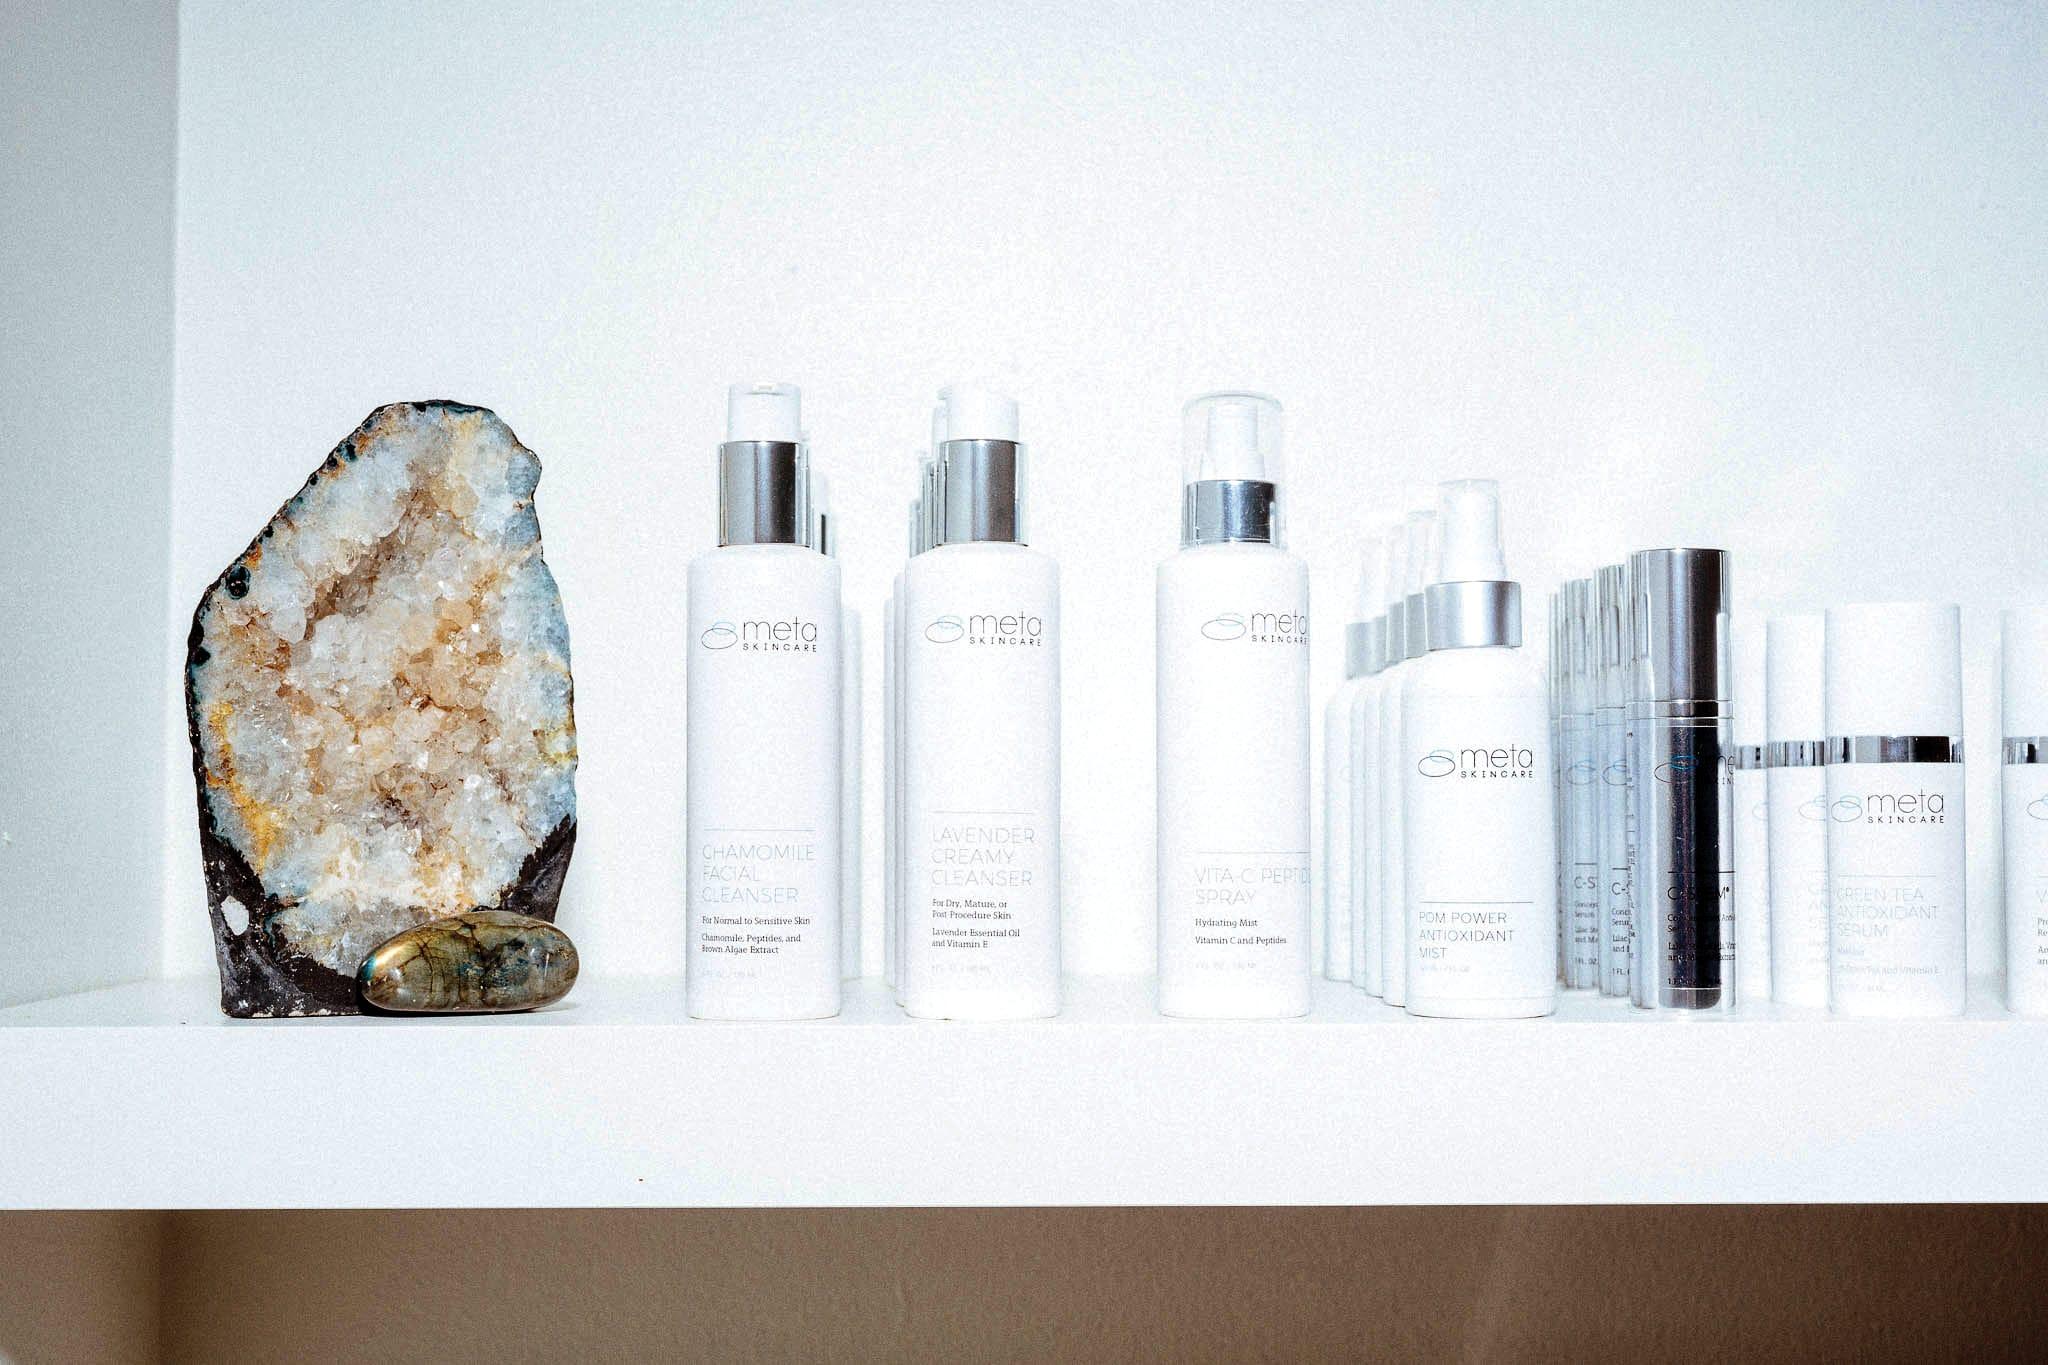 Meta Skin Studio Palm Springs Offers Cutting Edge Anti-Aging Treatment